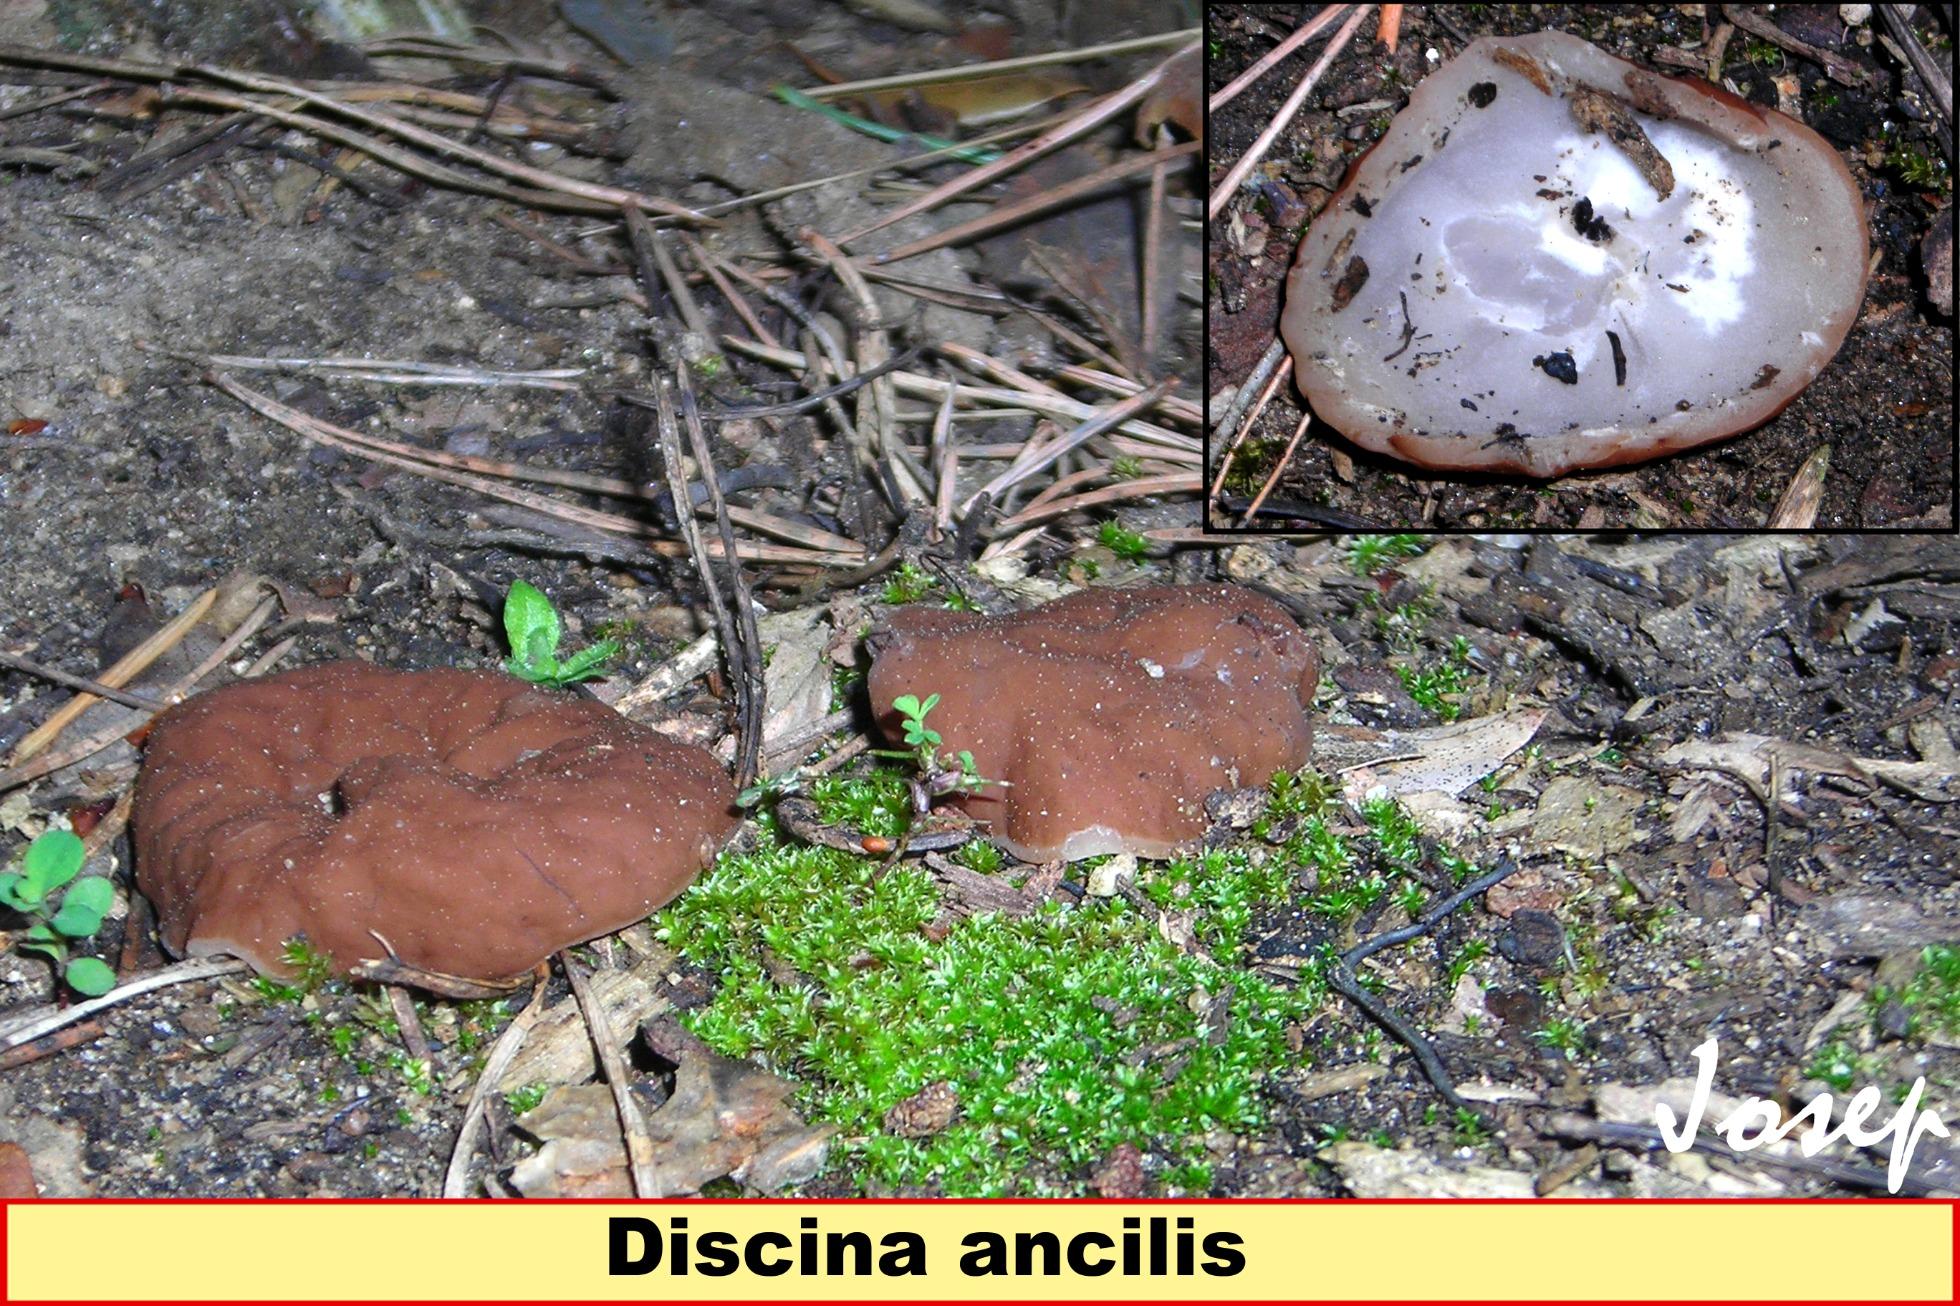 Discinaancilis_2021-03-03.jpg